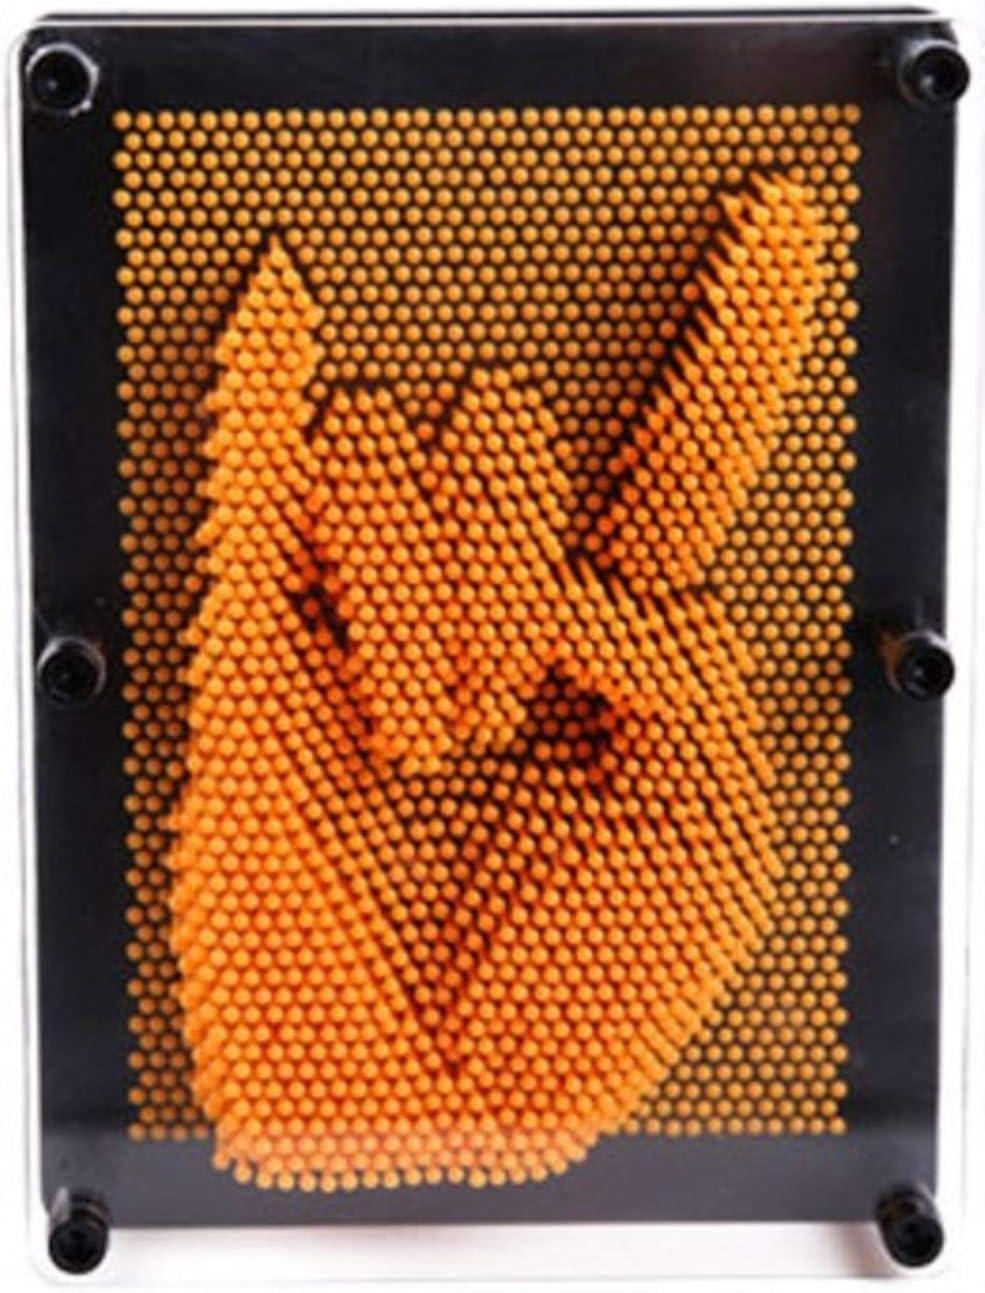 Pin Art 3D Escultura DIY Aguja Talla Mágica Estatuilla Molde Escritorio Juguete Decoración Hogar Maison Habitación Decorativa Adorno Decoración para el hogar, Naranja, XL: Amazon.es: Hogar